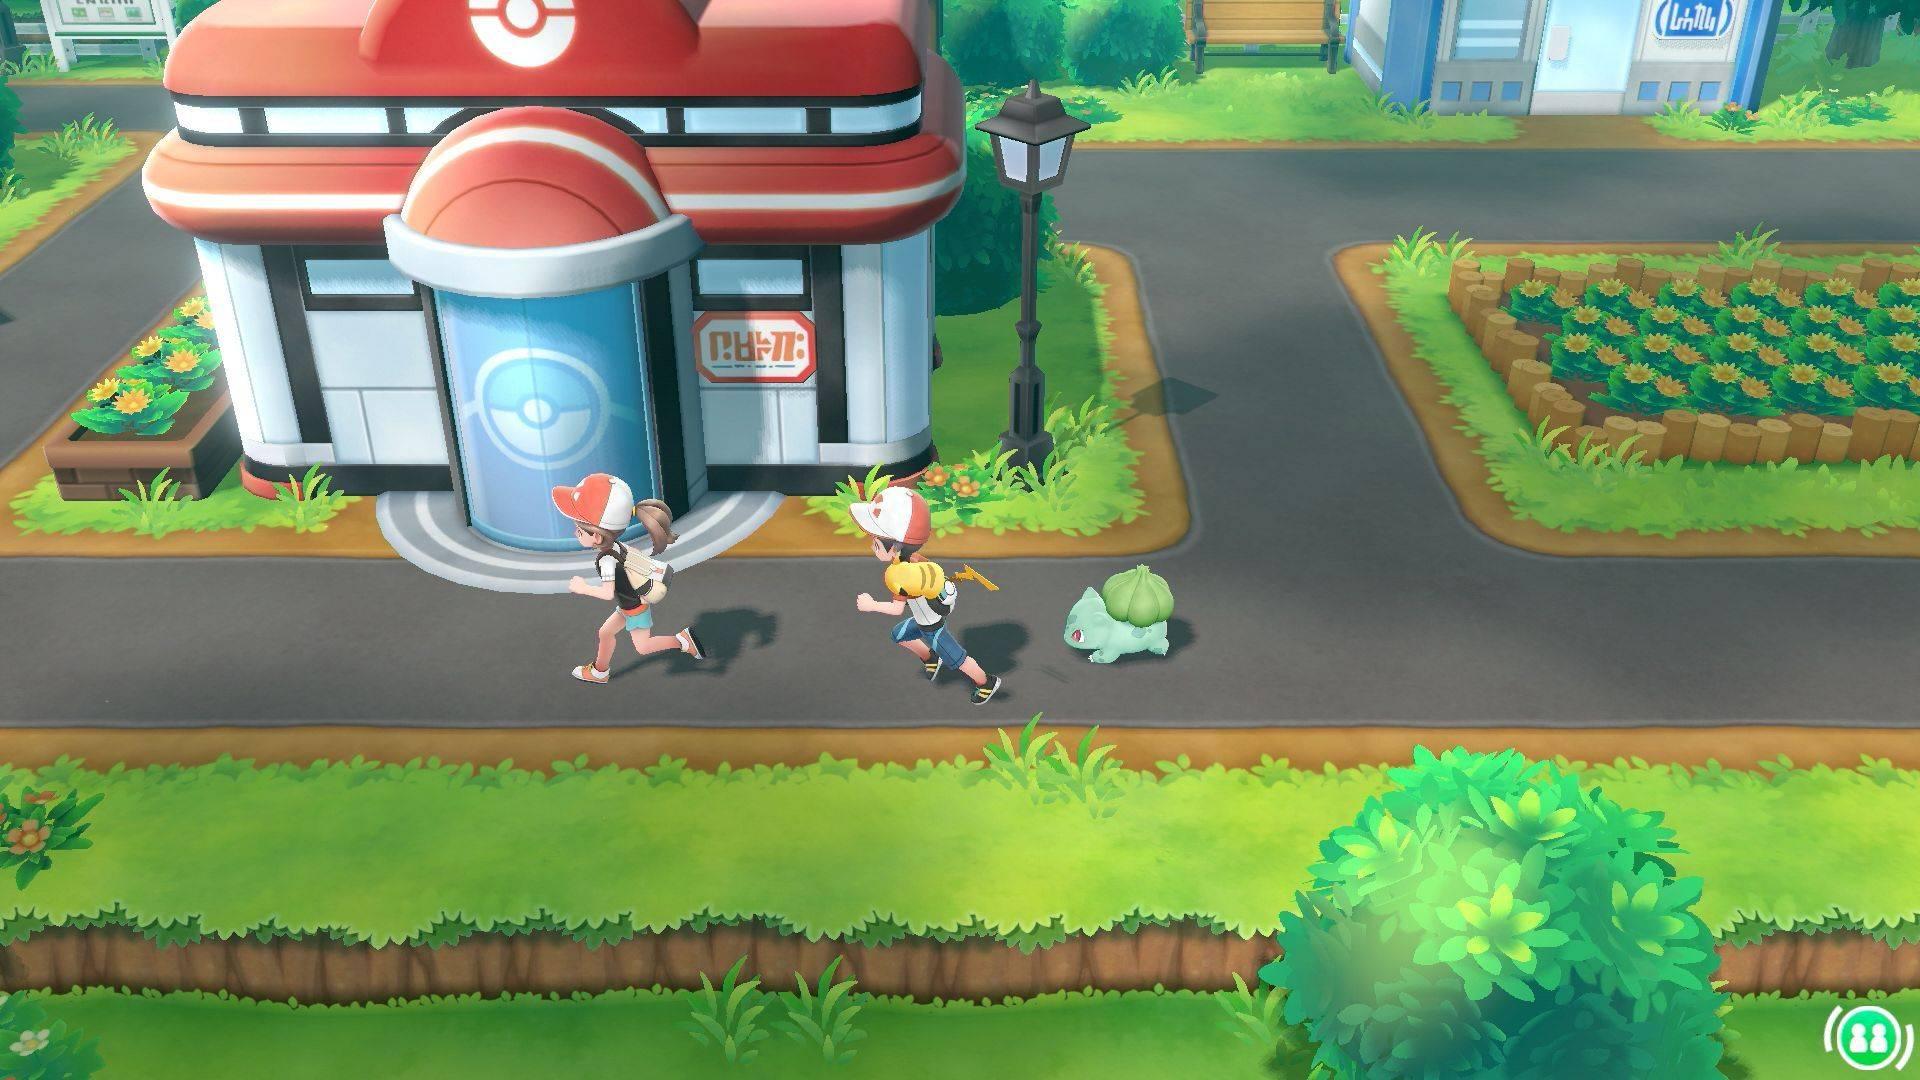 pokemon-lets-go-pikachu-lets-go-eevee-2018530828_7